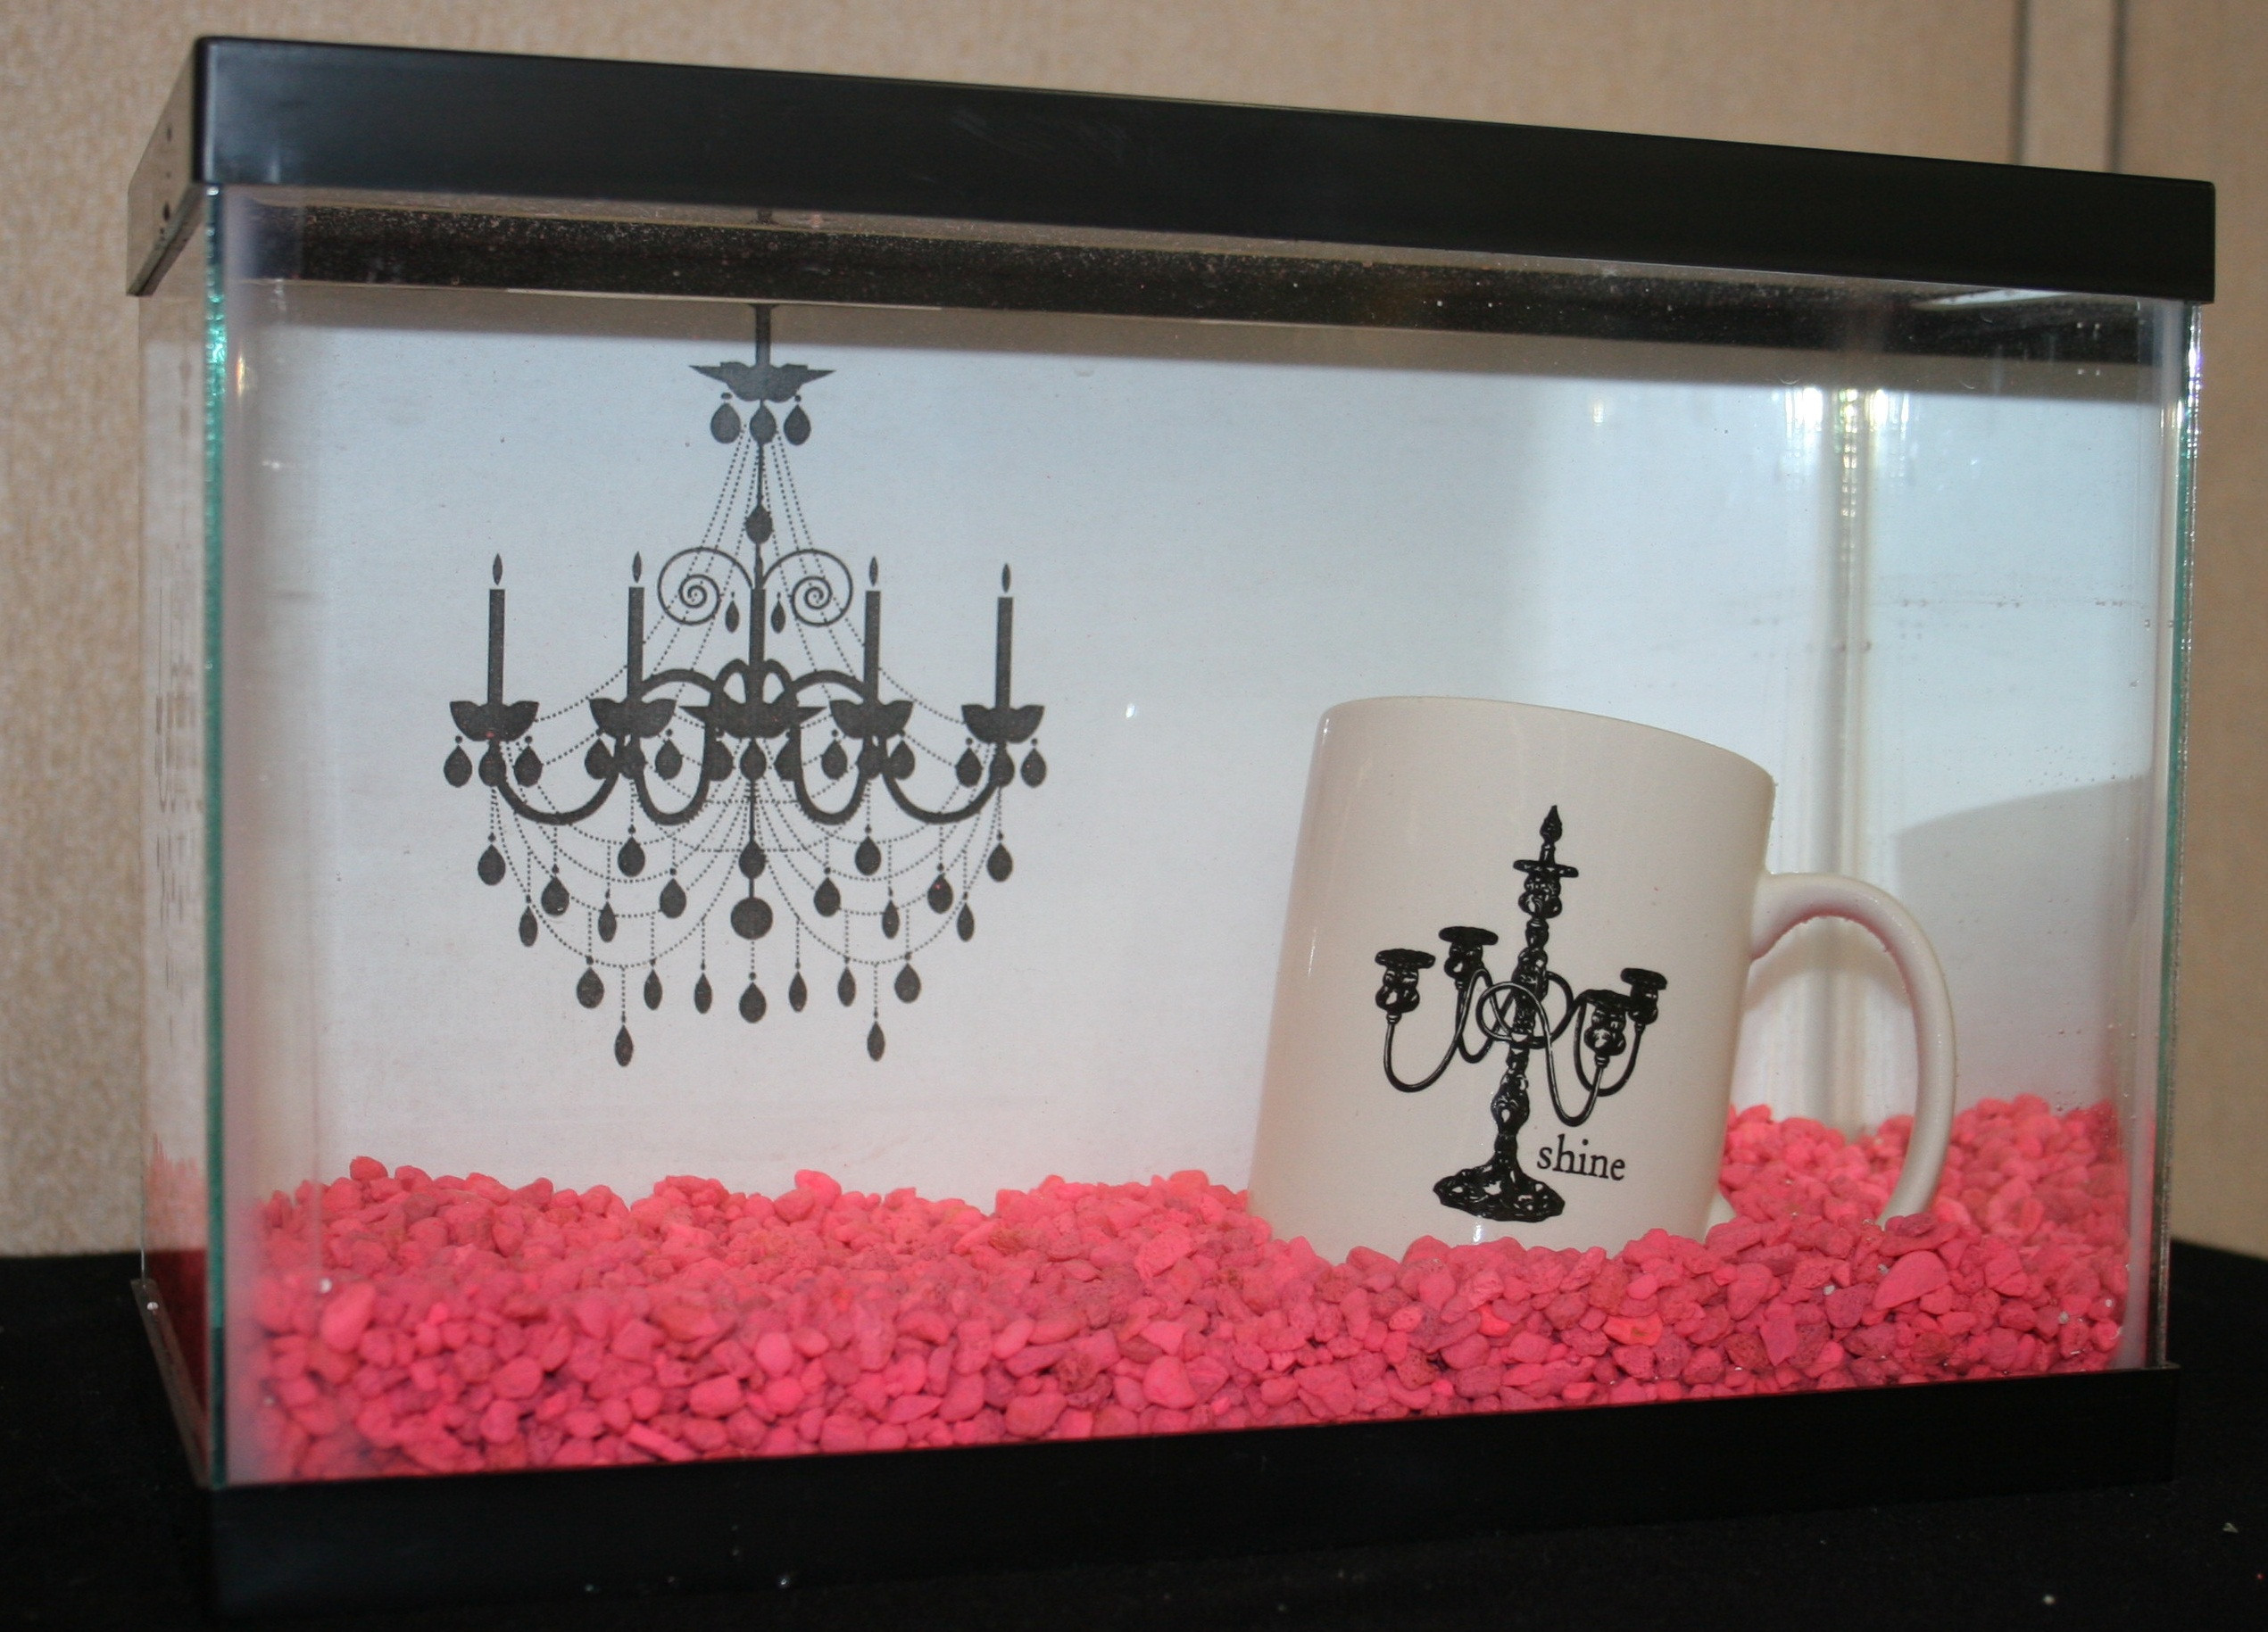 Best ideas about DIY Fish Tank Decor . Save or Pin Aquarium Decoration Ideas & DIY Fish Bowls Now.